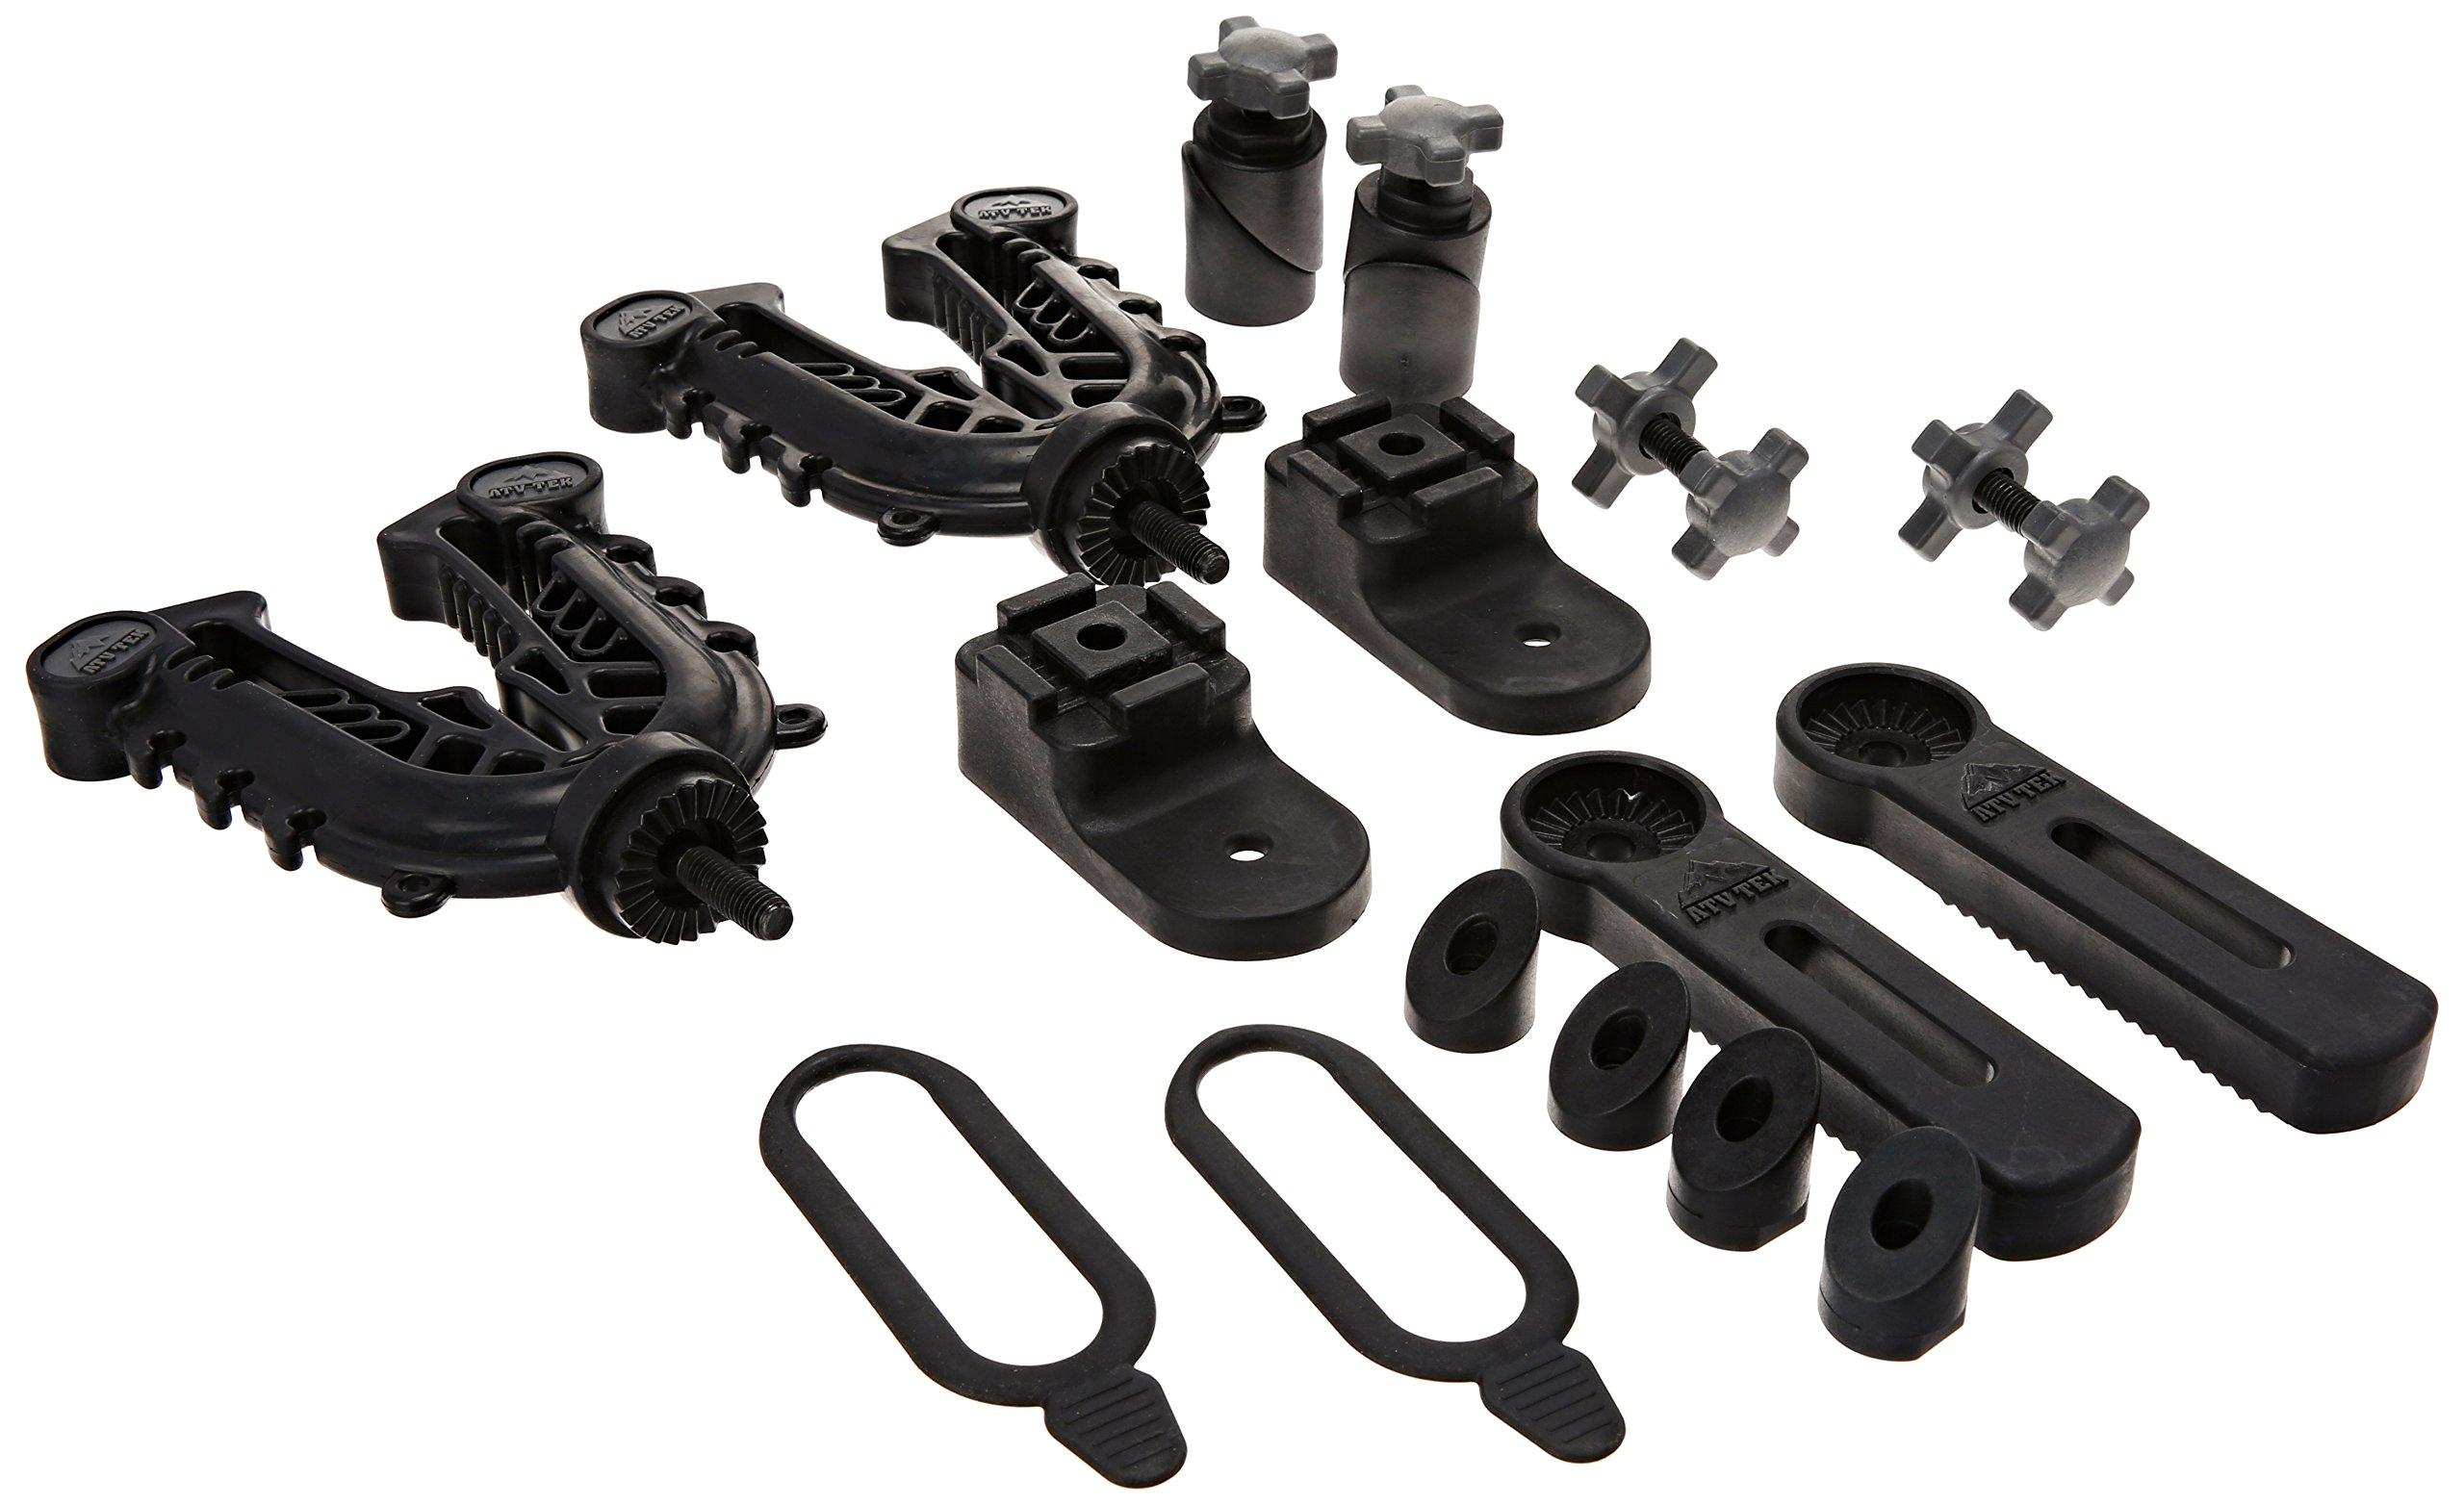 ATV Tek PFFG1 FlexGrip Pro Wedgelock Single Gun/Bow/Tool Rack